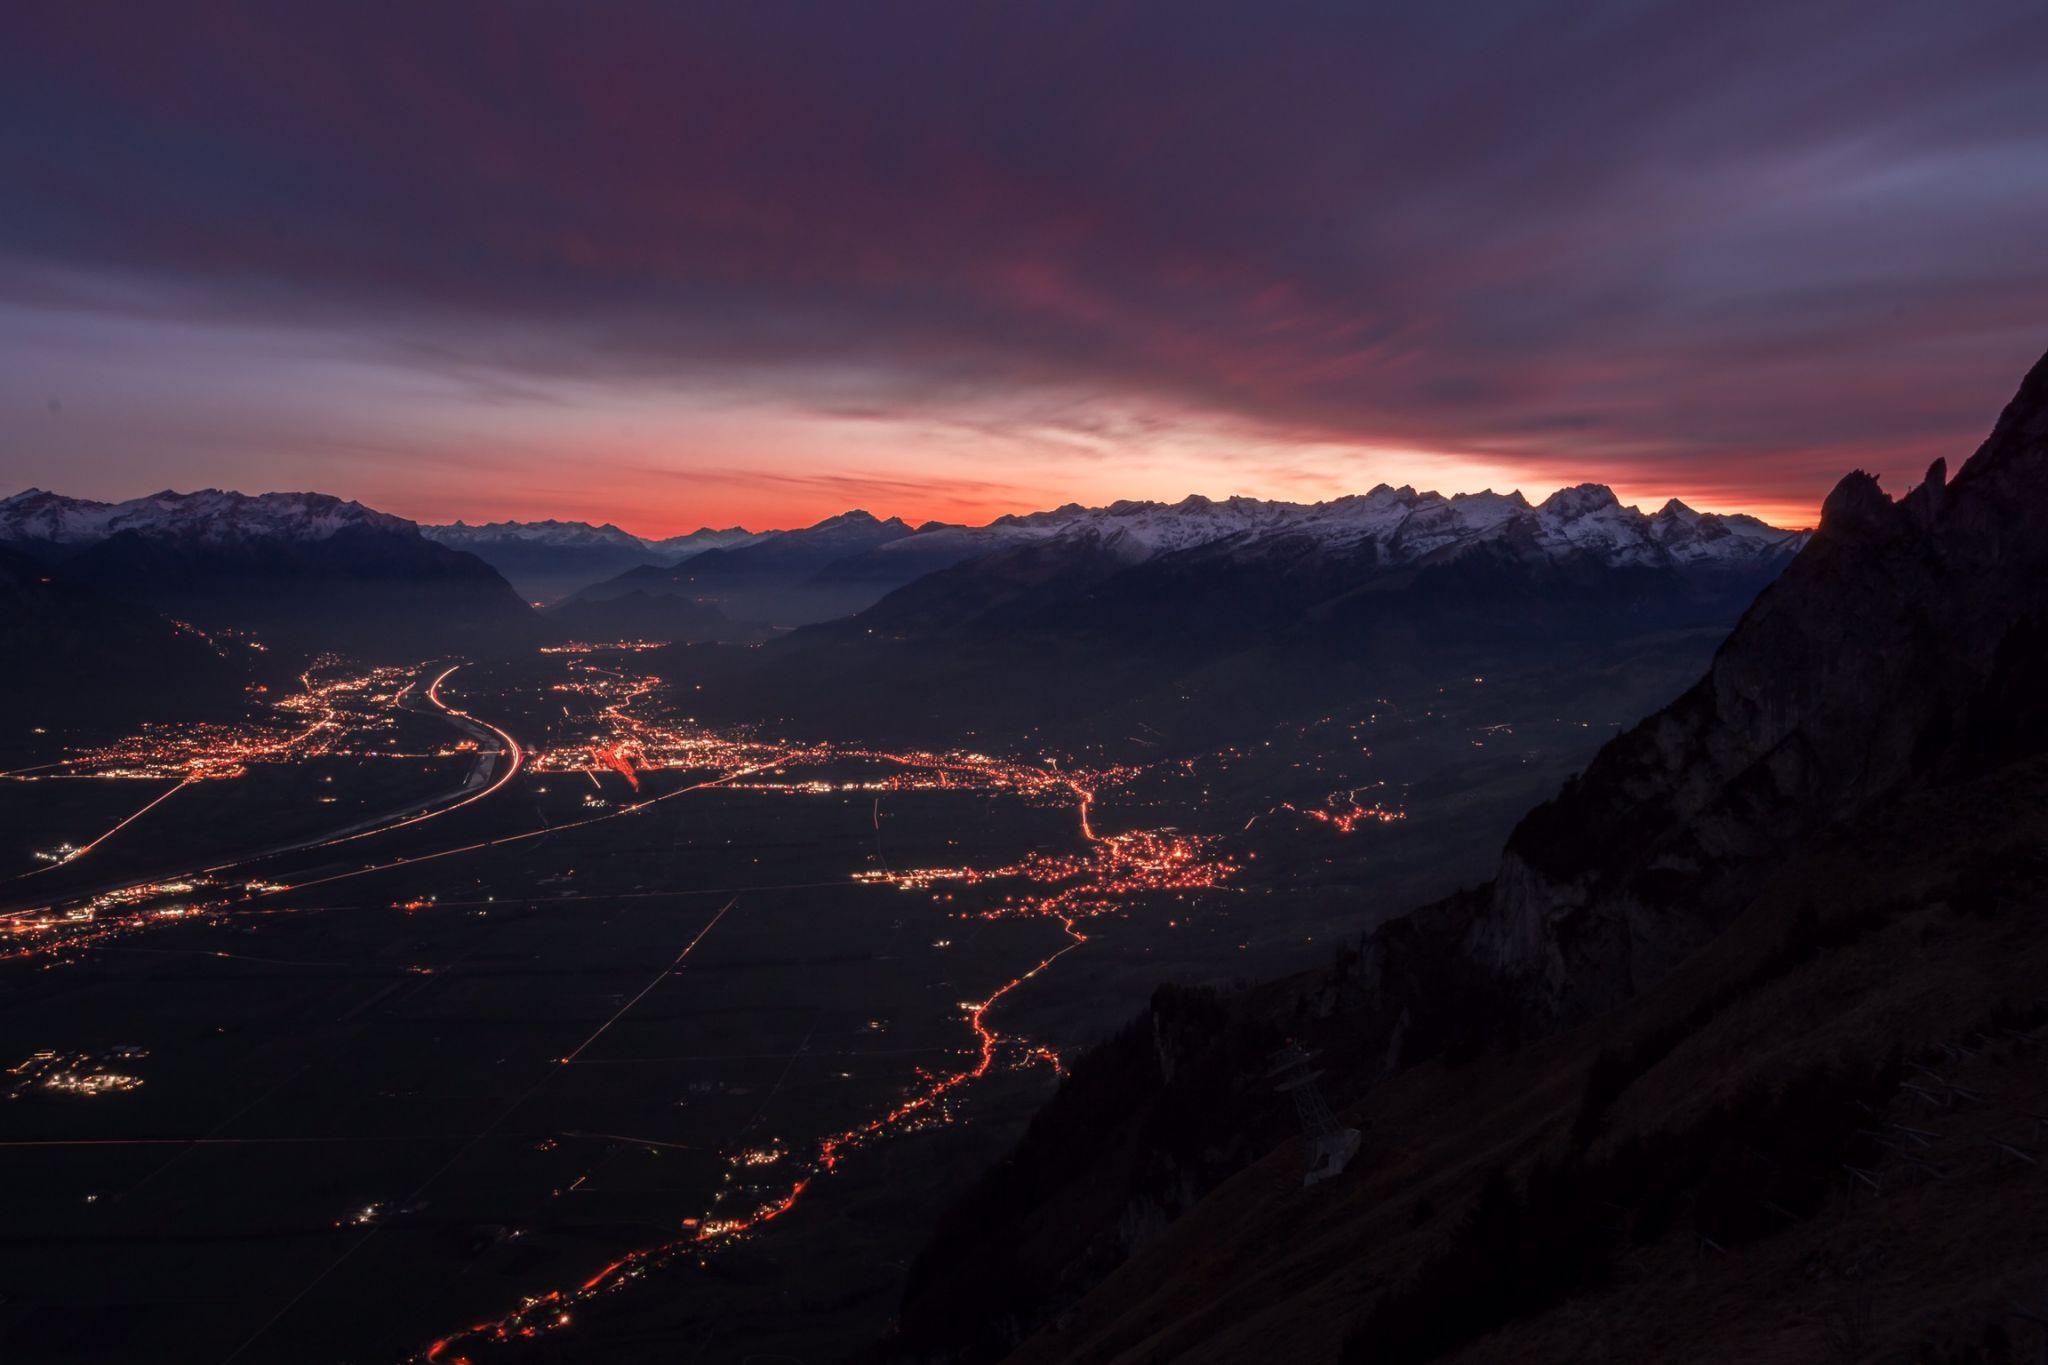 Stauberen, Switzerland